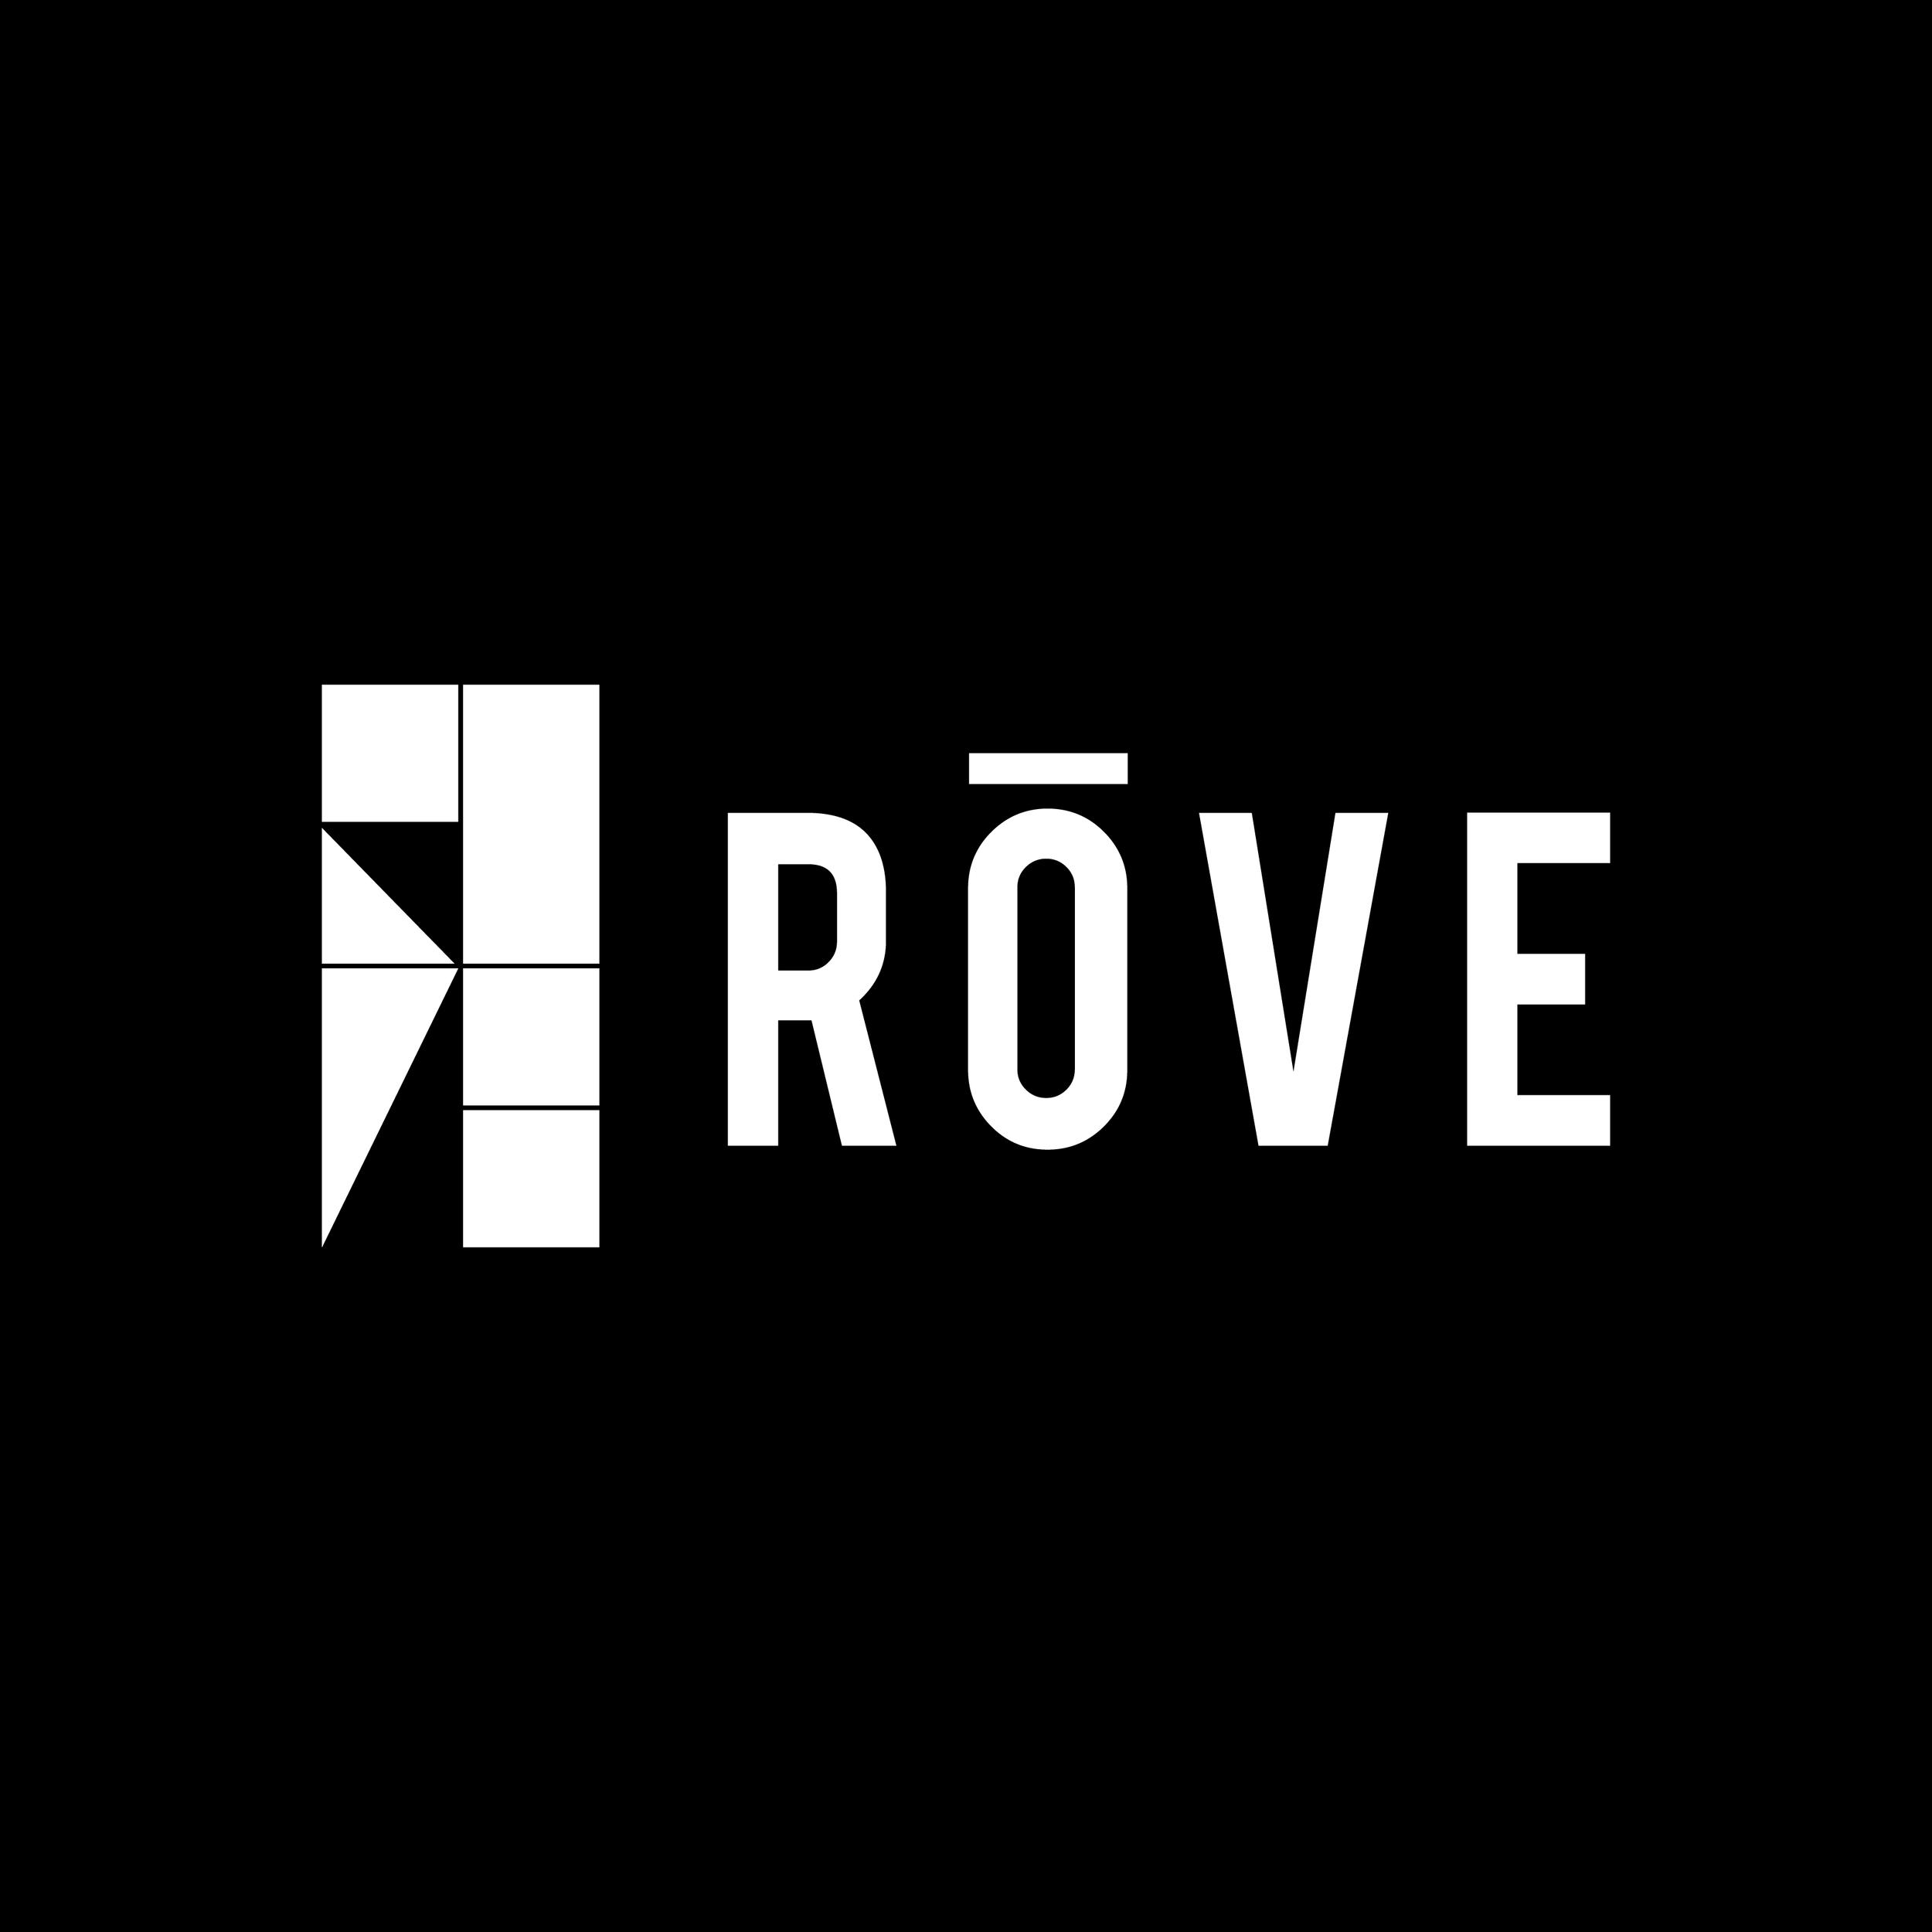 ROVE_BradmarkSolo_W_vF-01.png